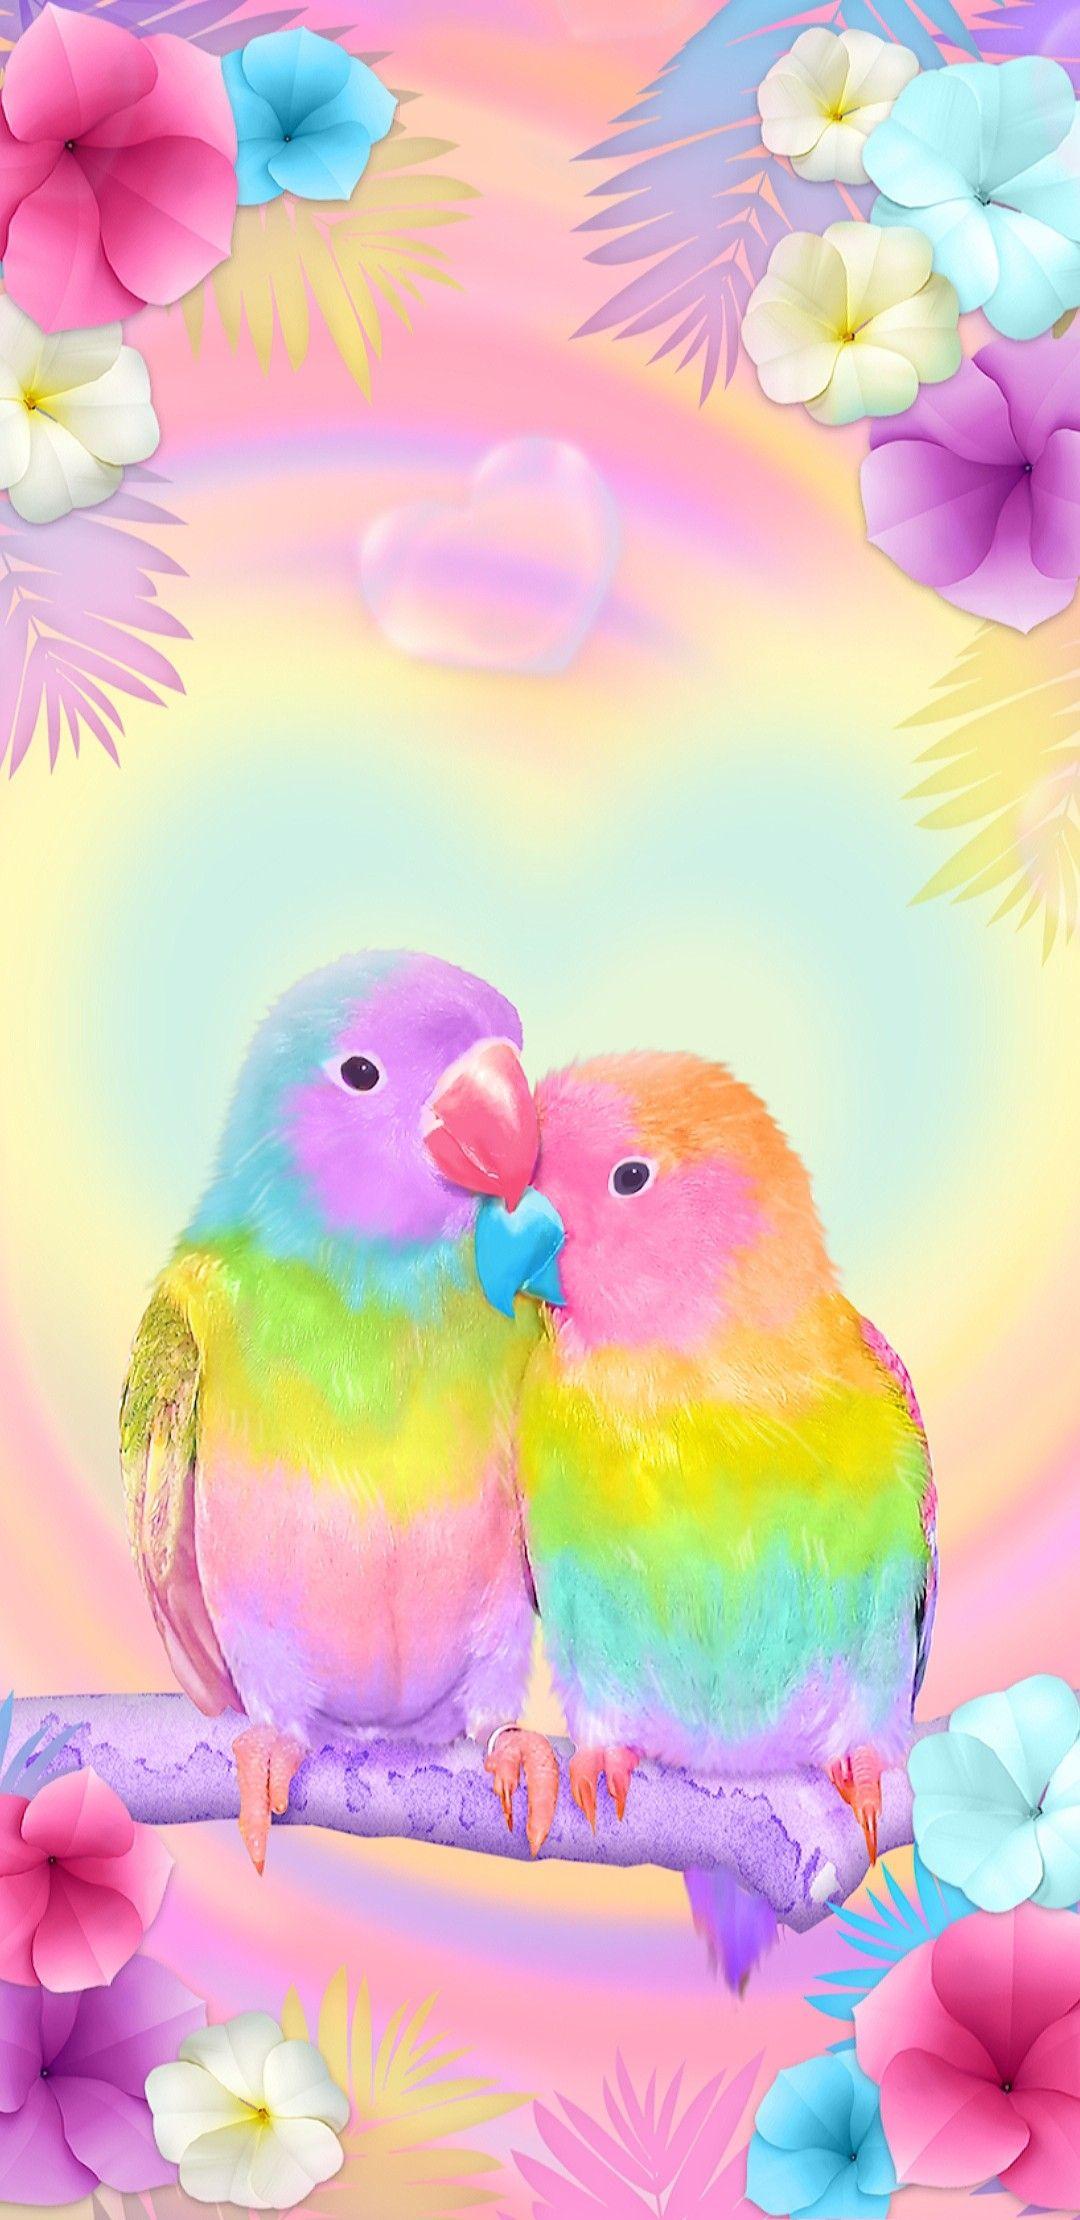 Beautiful White Love Birds Bird Wallpaper Beautiful Wallpapers Birds Wallpaper Hd